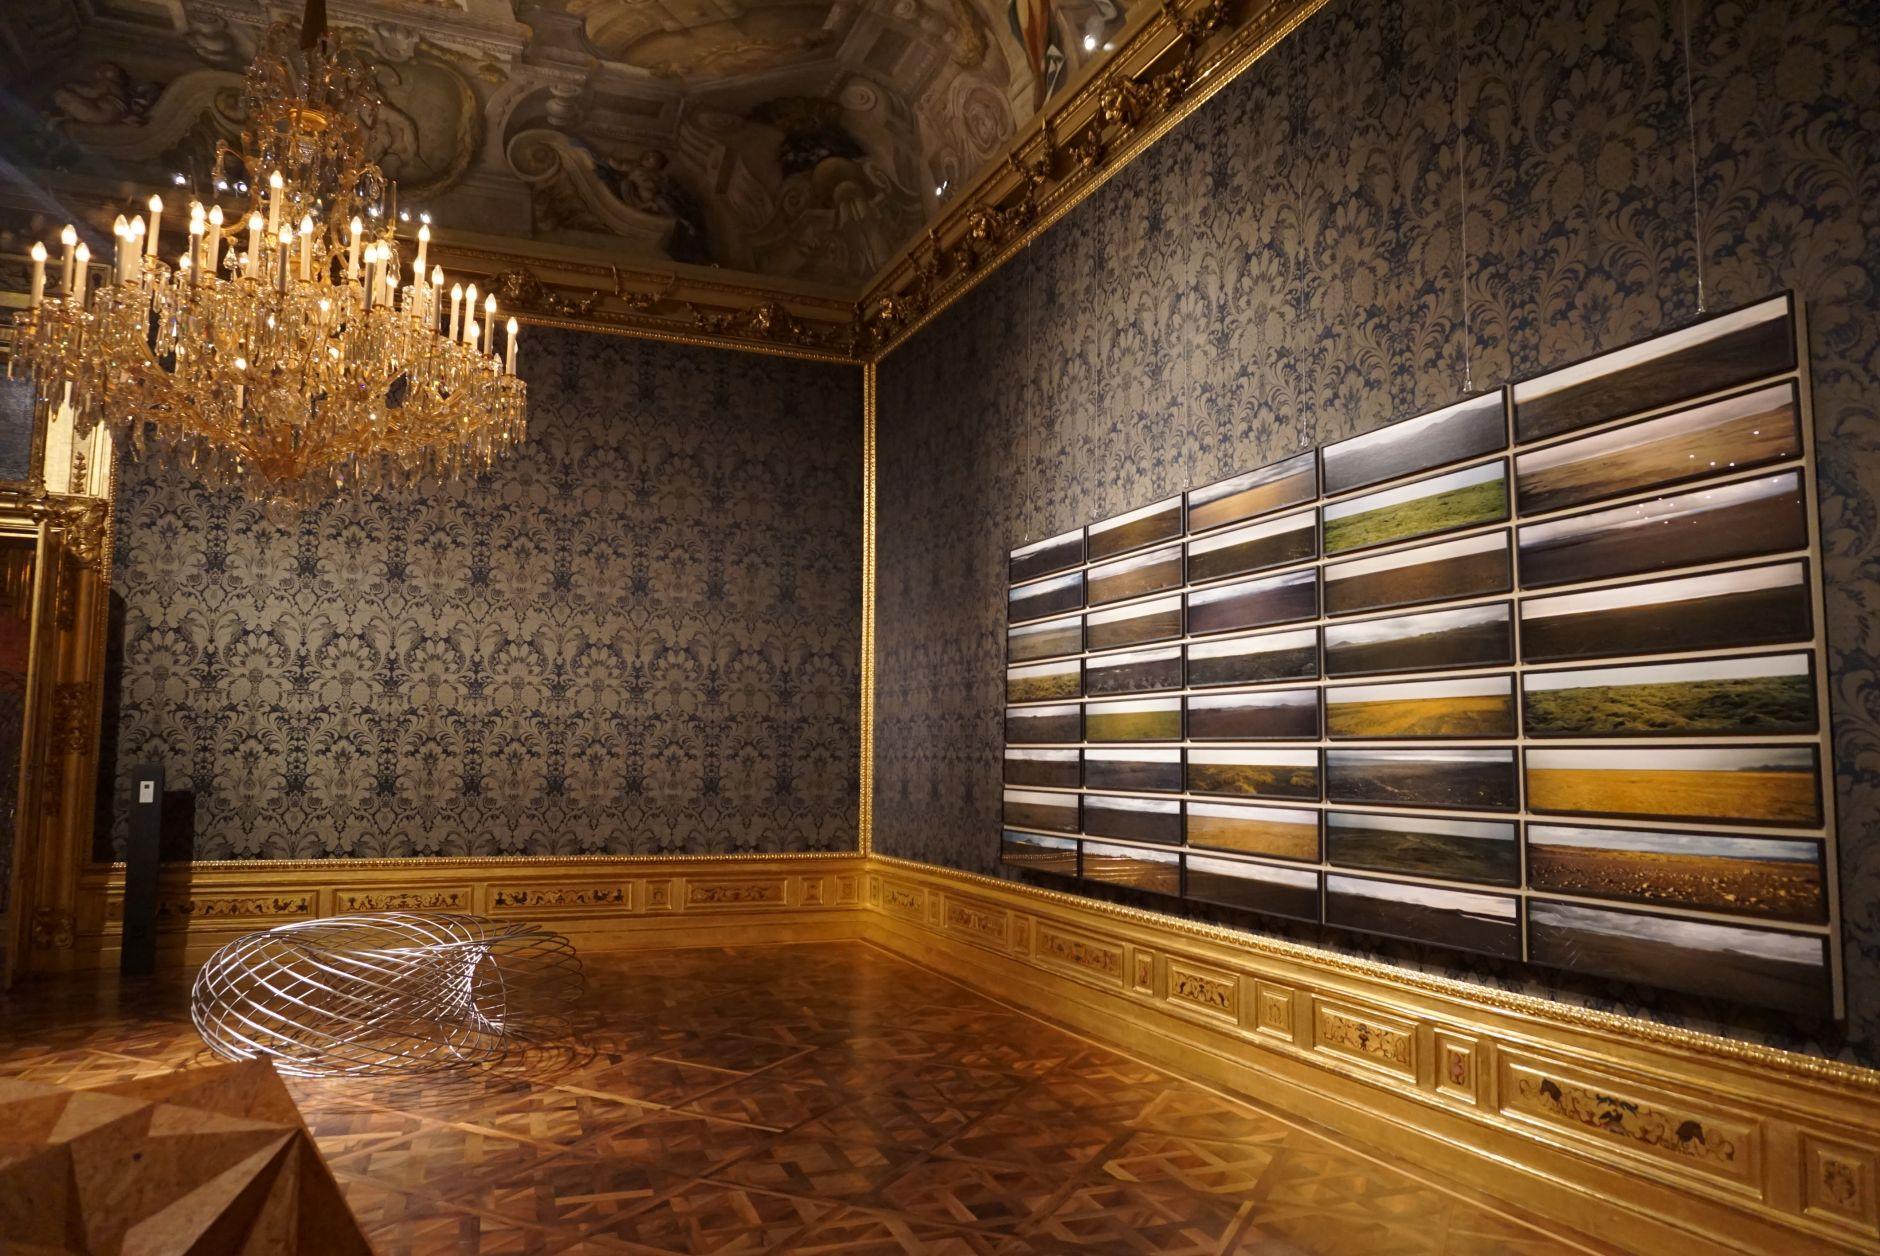 dc-art-olafur-eliasson-baroque-baroque-the-winter-palace-of-prince-eugene-of-savoy-vienna-22